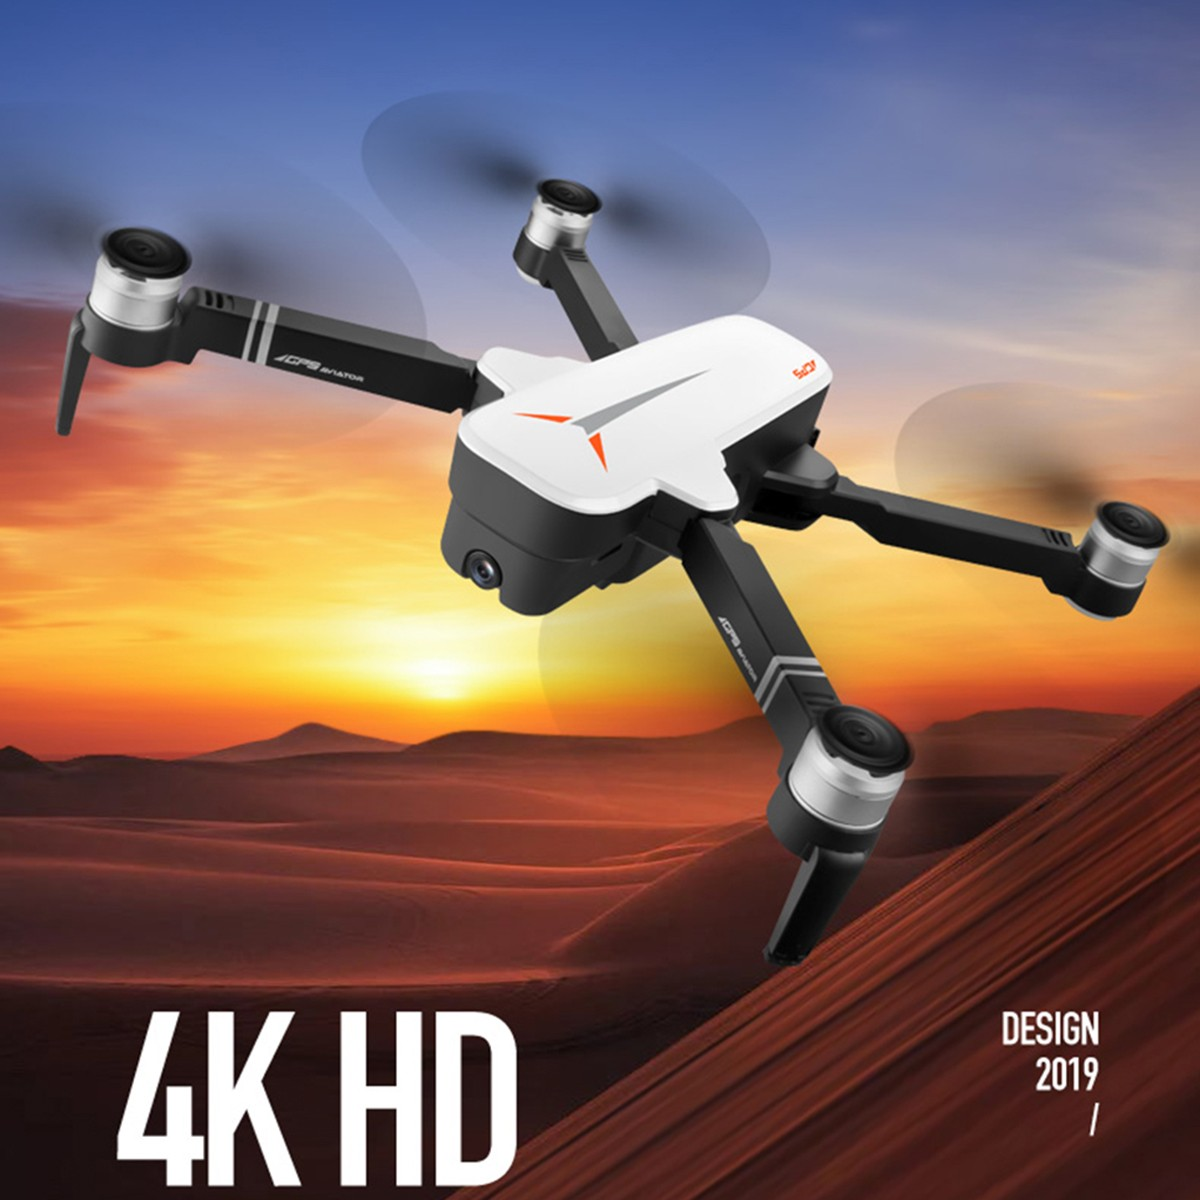 X9 Drone 4K HD GPS Drone WiFi Fpv Quadcopter Brushless Motor Servo Camera Intelligent Return Drone With Camera